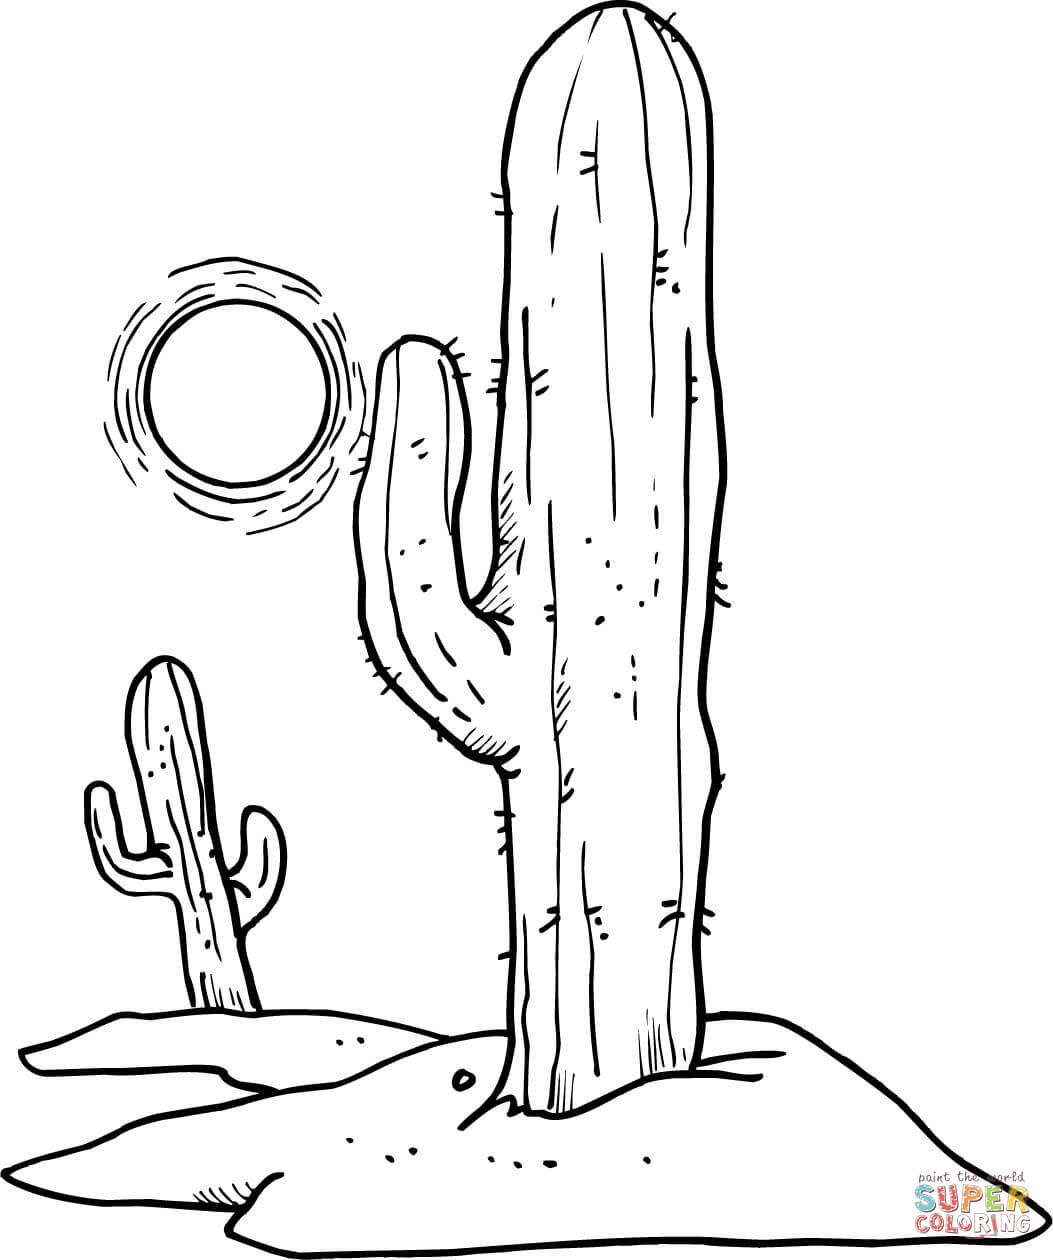 Desenho De Sol Sobre Cactos Do Deserto Para Colorir